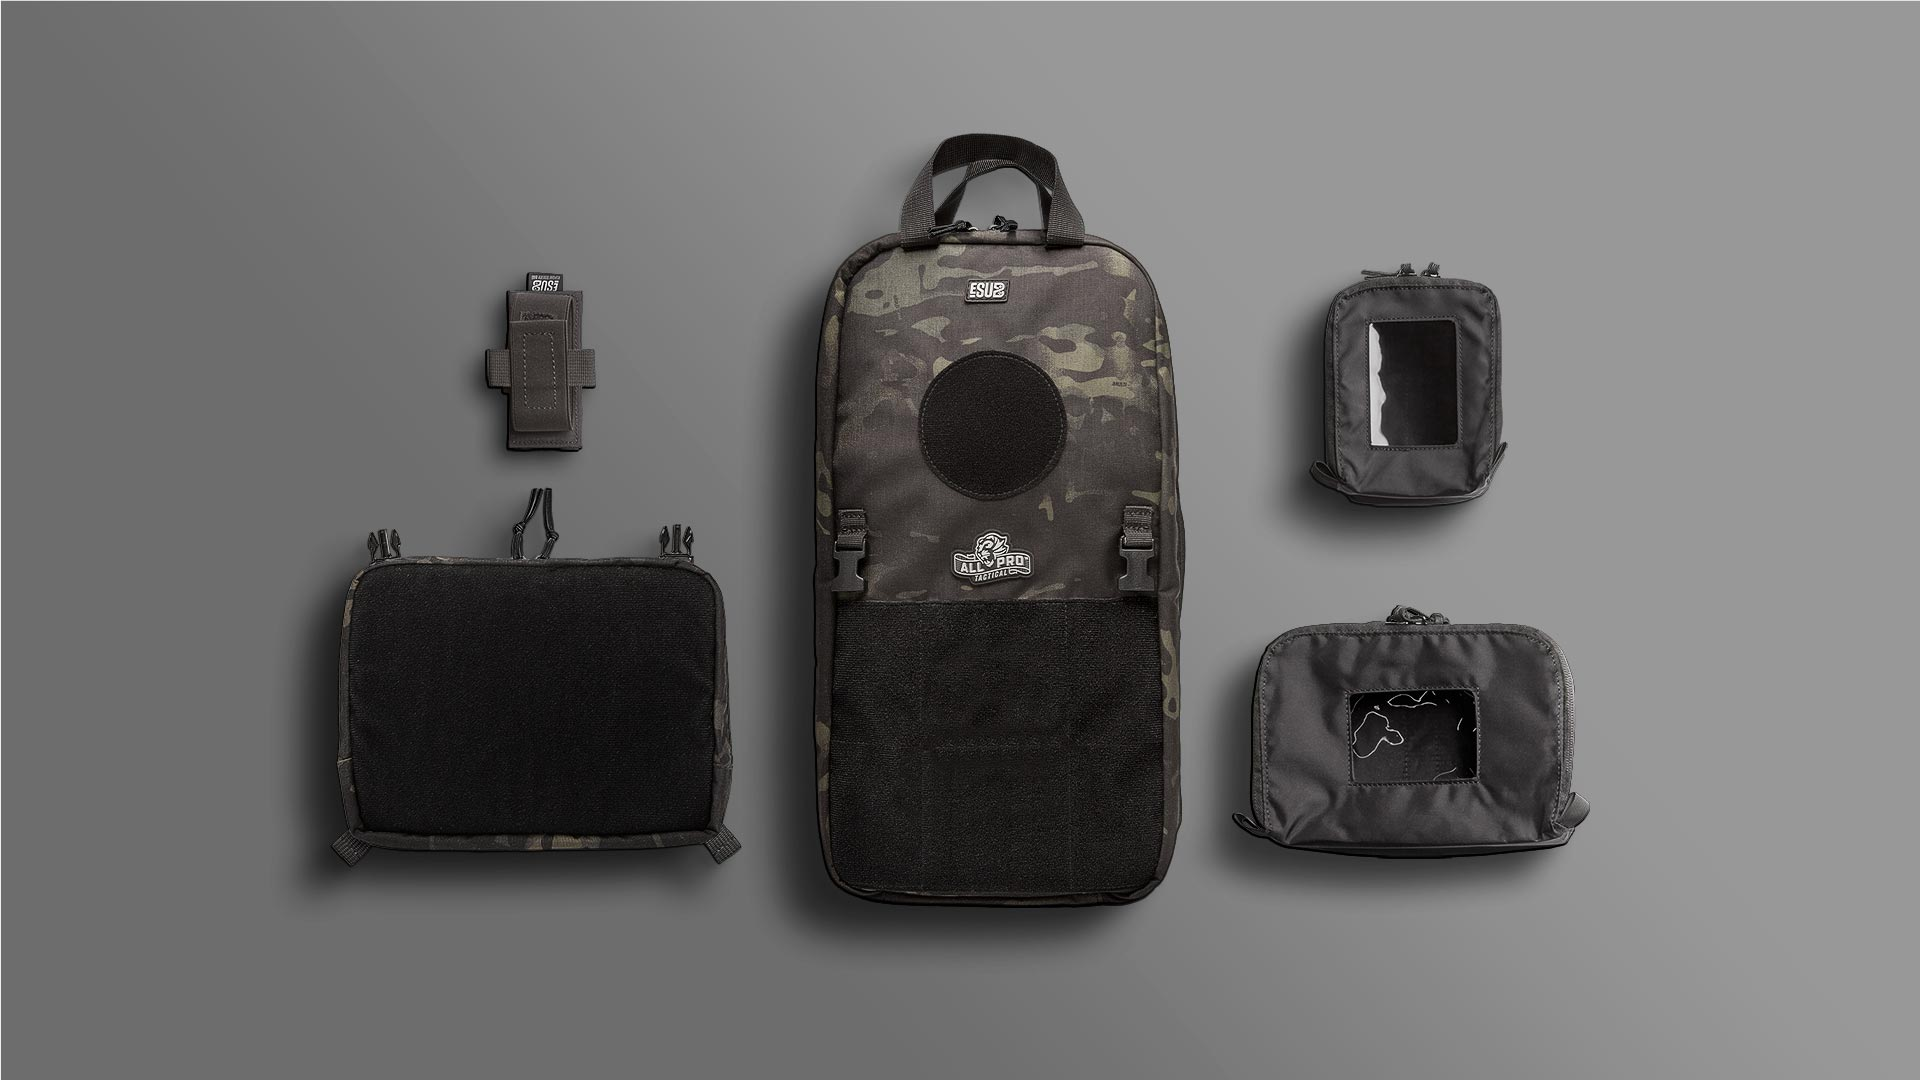 MultiCam Black Edition ESUB Go Bag & Components